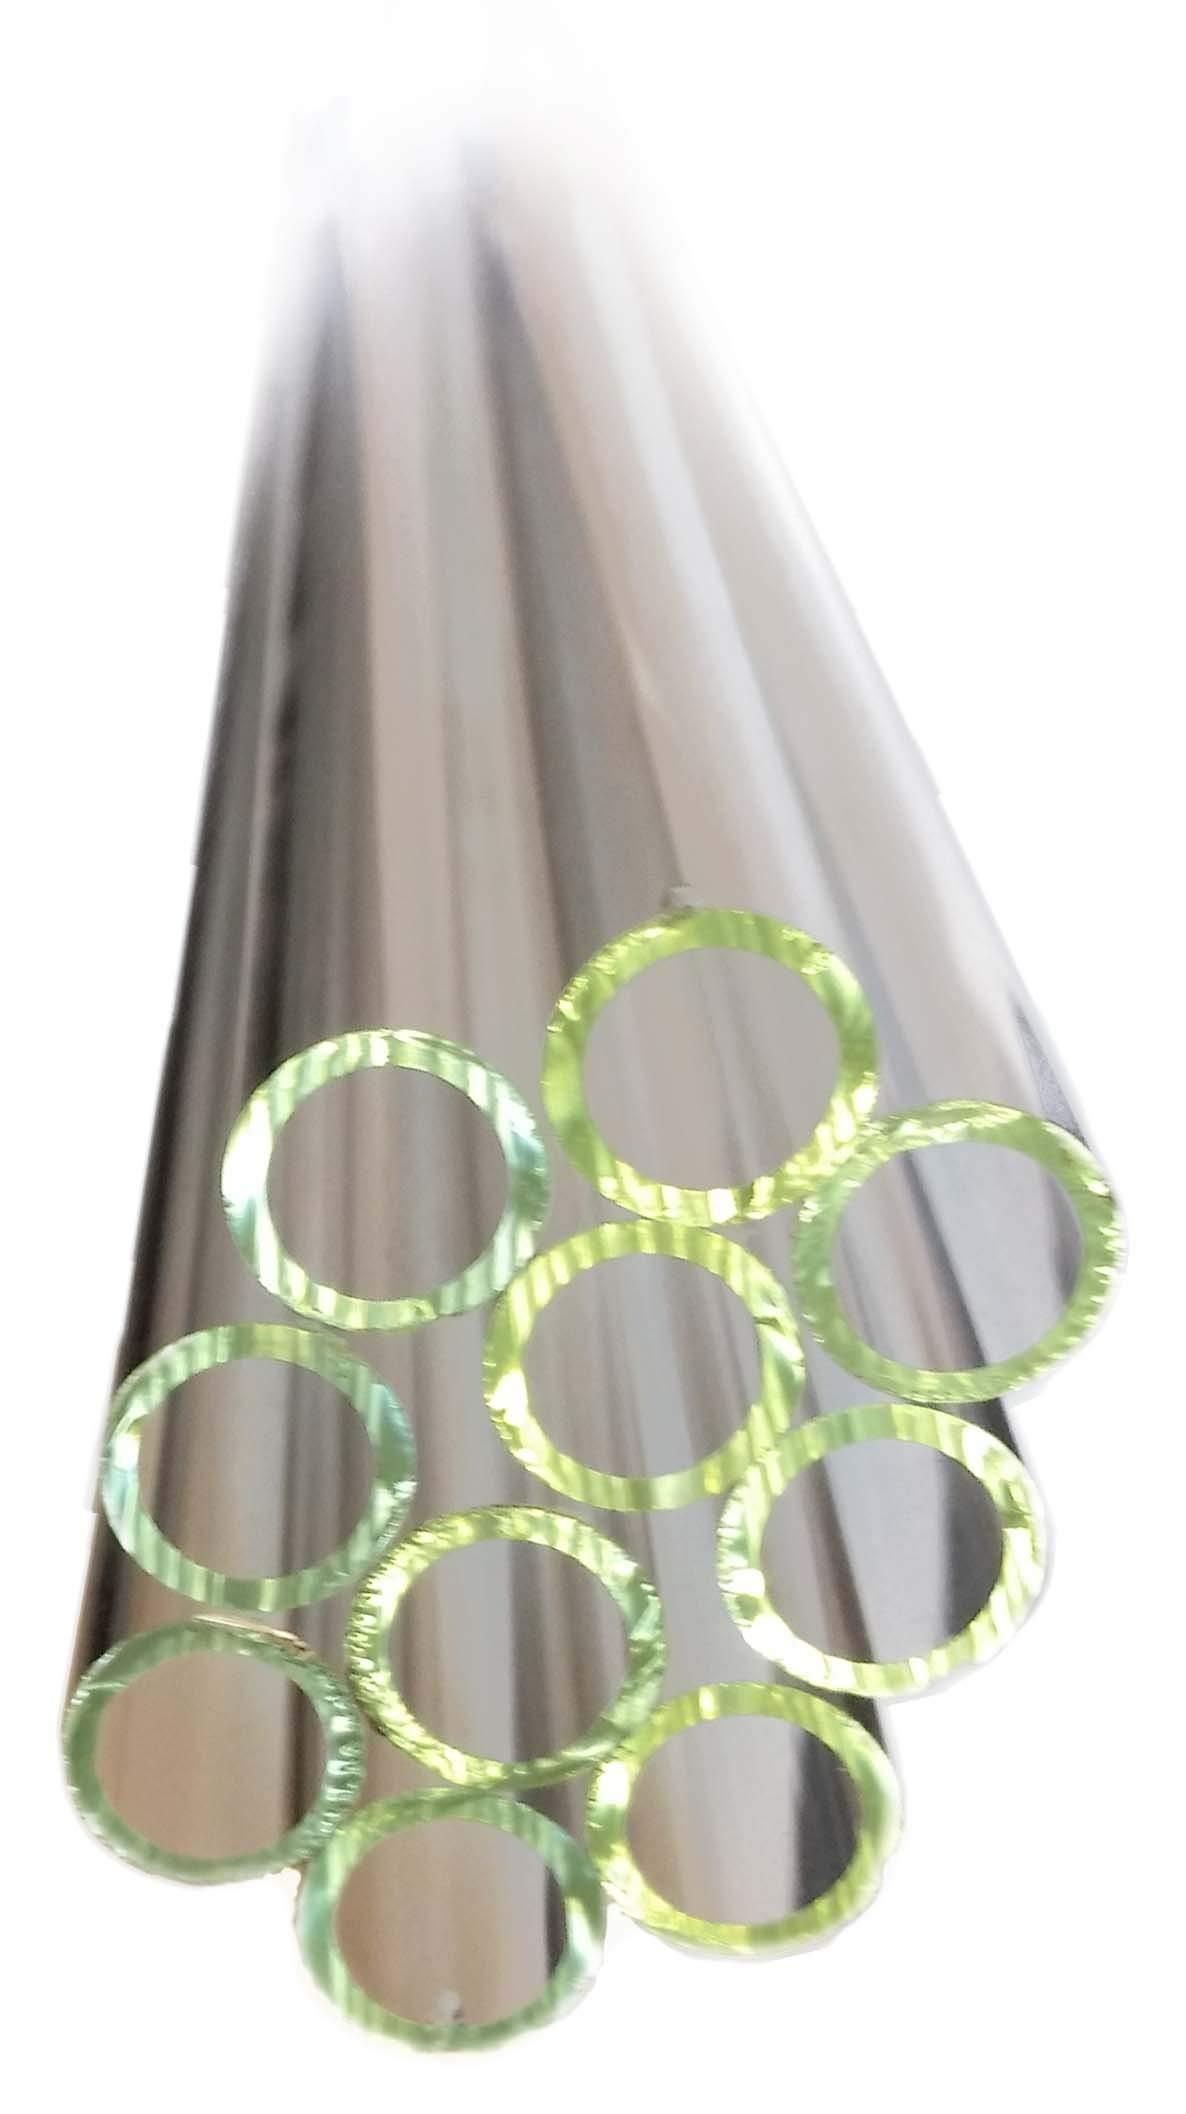 GSC International 10MMBT-24 Borosilicate Glass Tubing, 10mm Diameter, 24'' Long (1-Pound Pack)